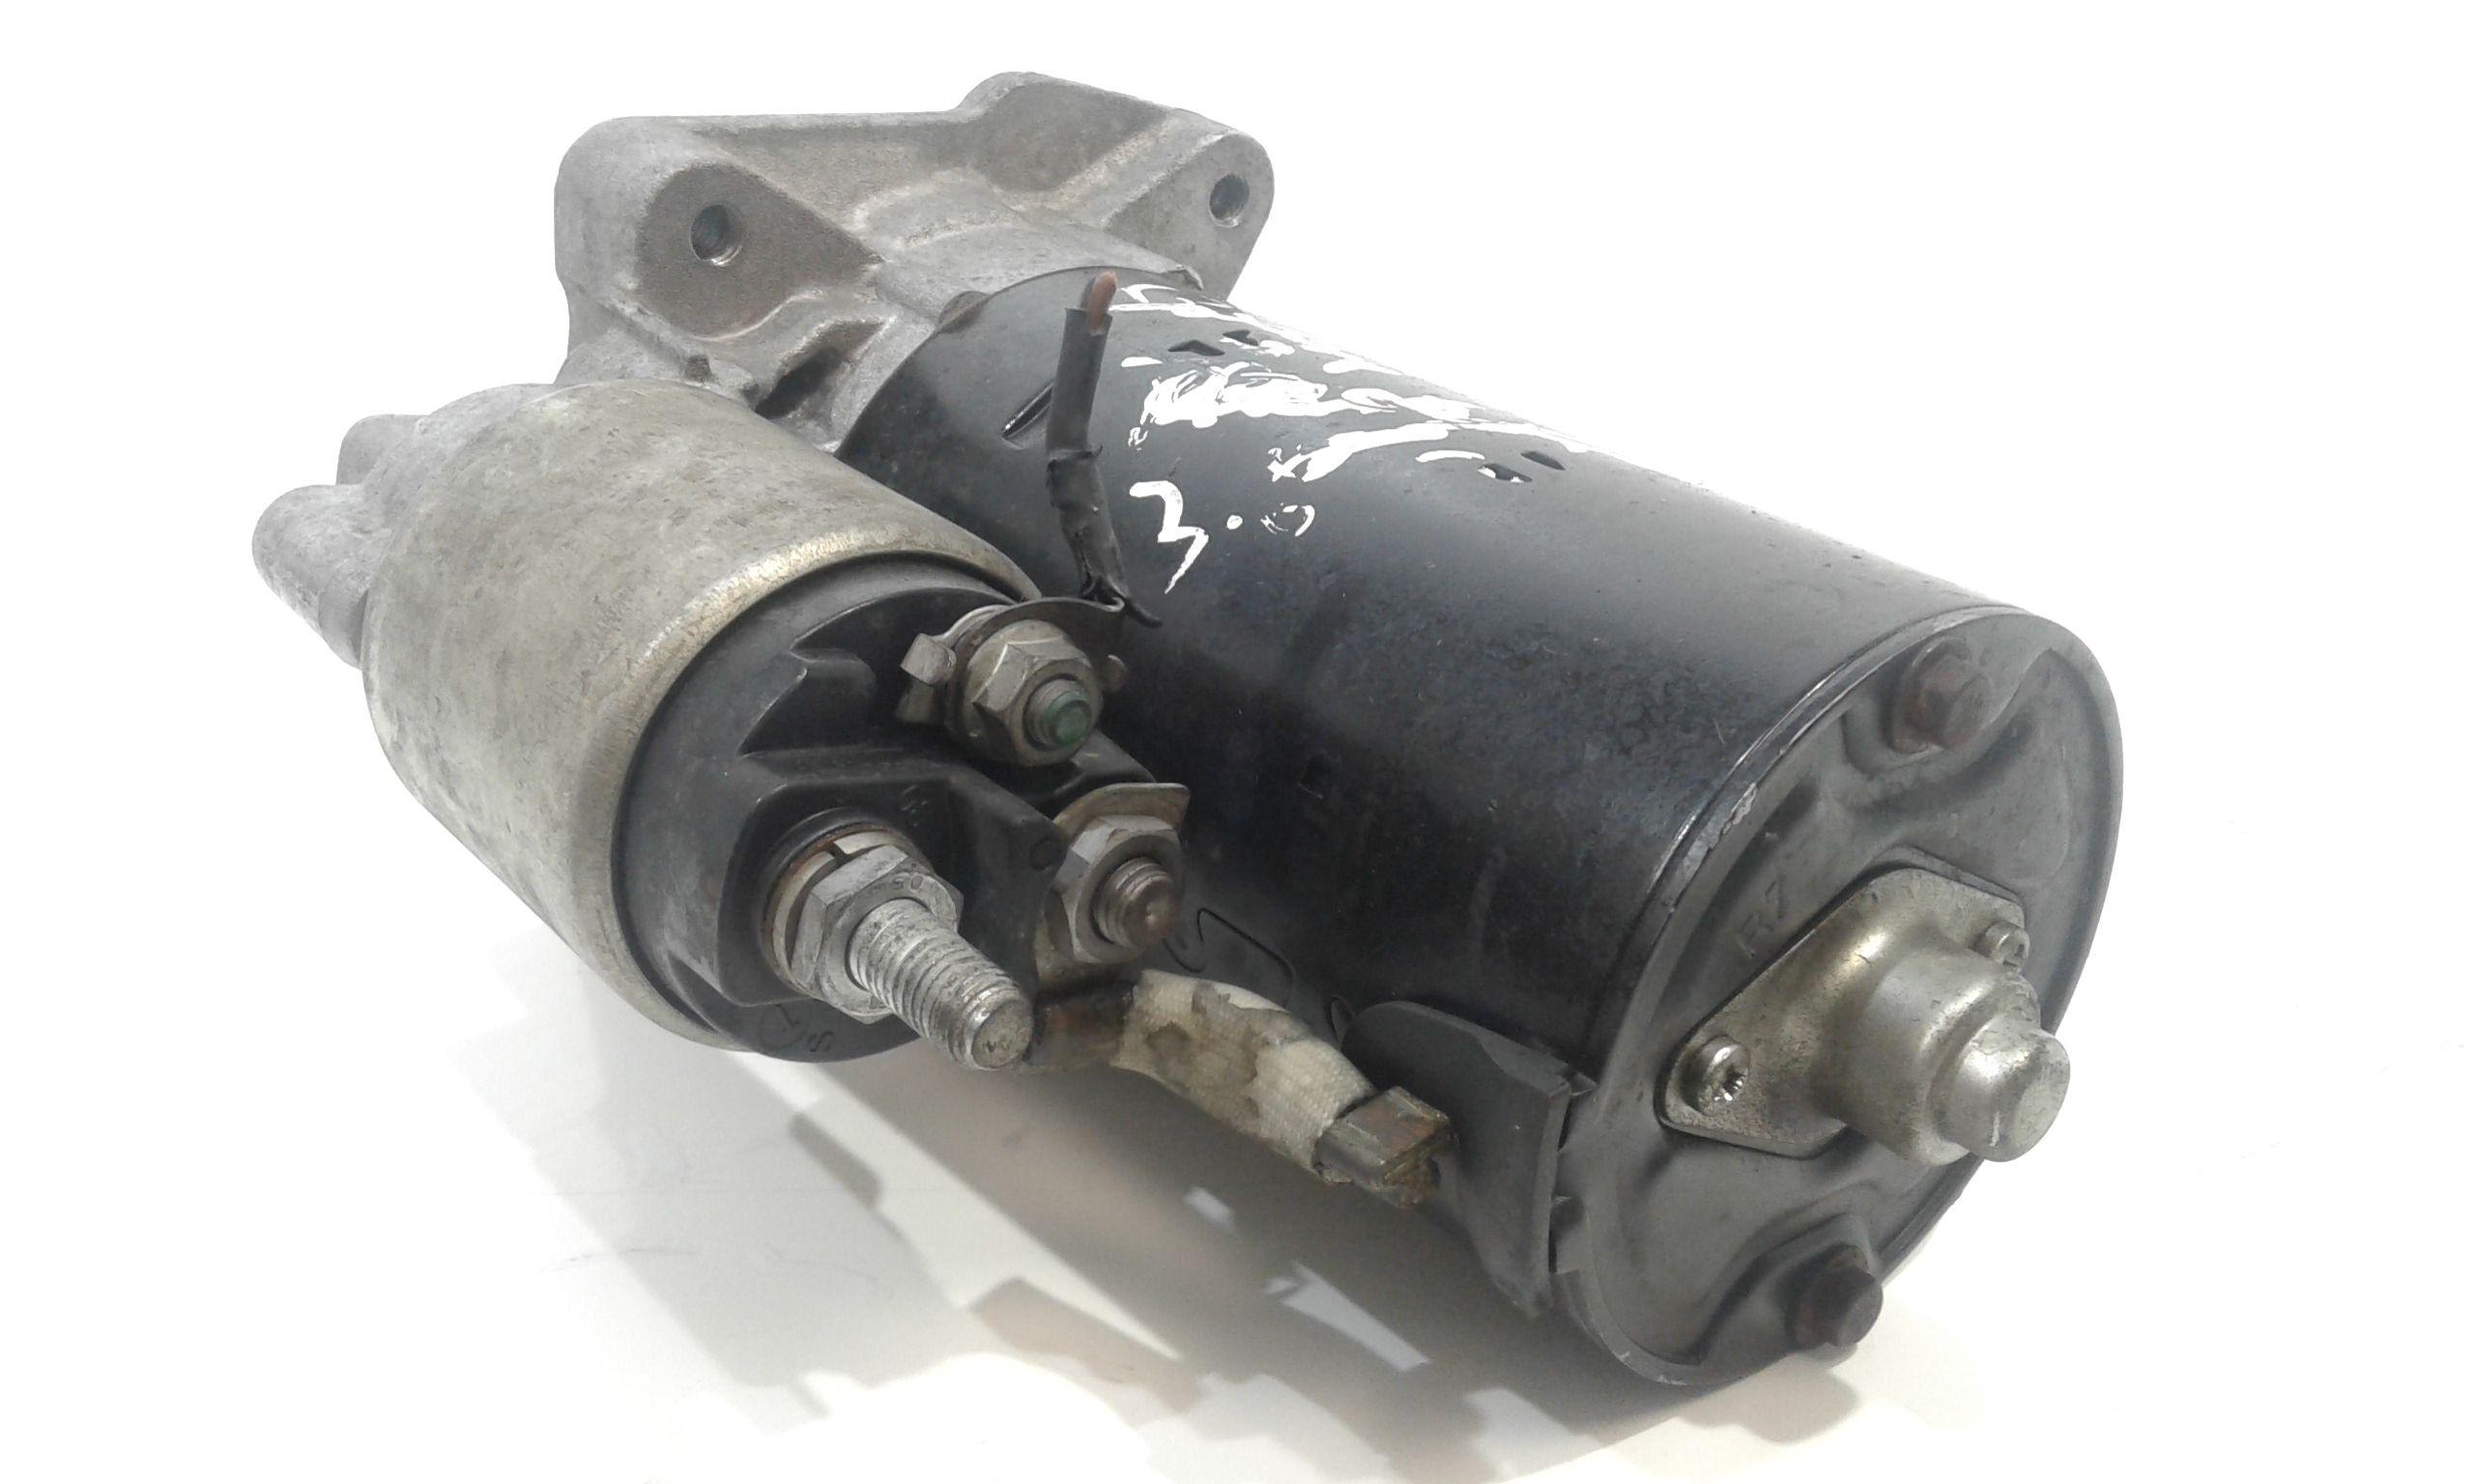 MOTORINO D' AVVIAMENTO PEUGEOT Boxer 3° Serie 3000 Diesel    (2008) RICAMBI USATI